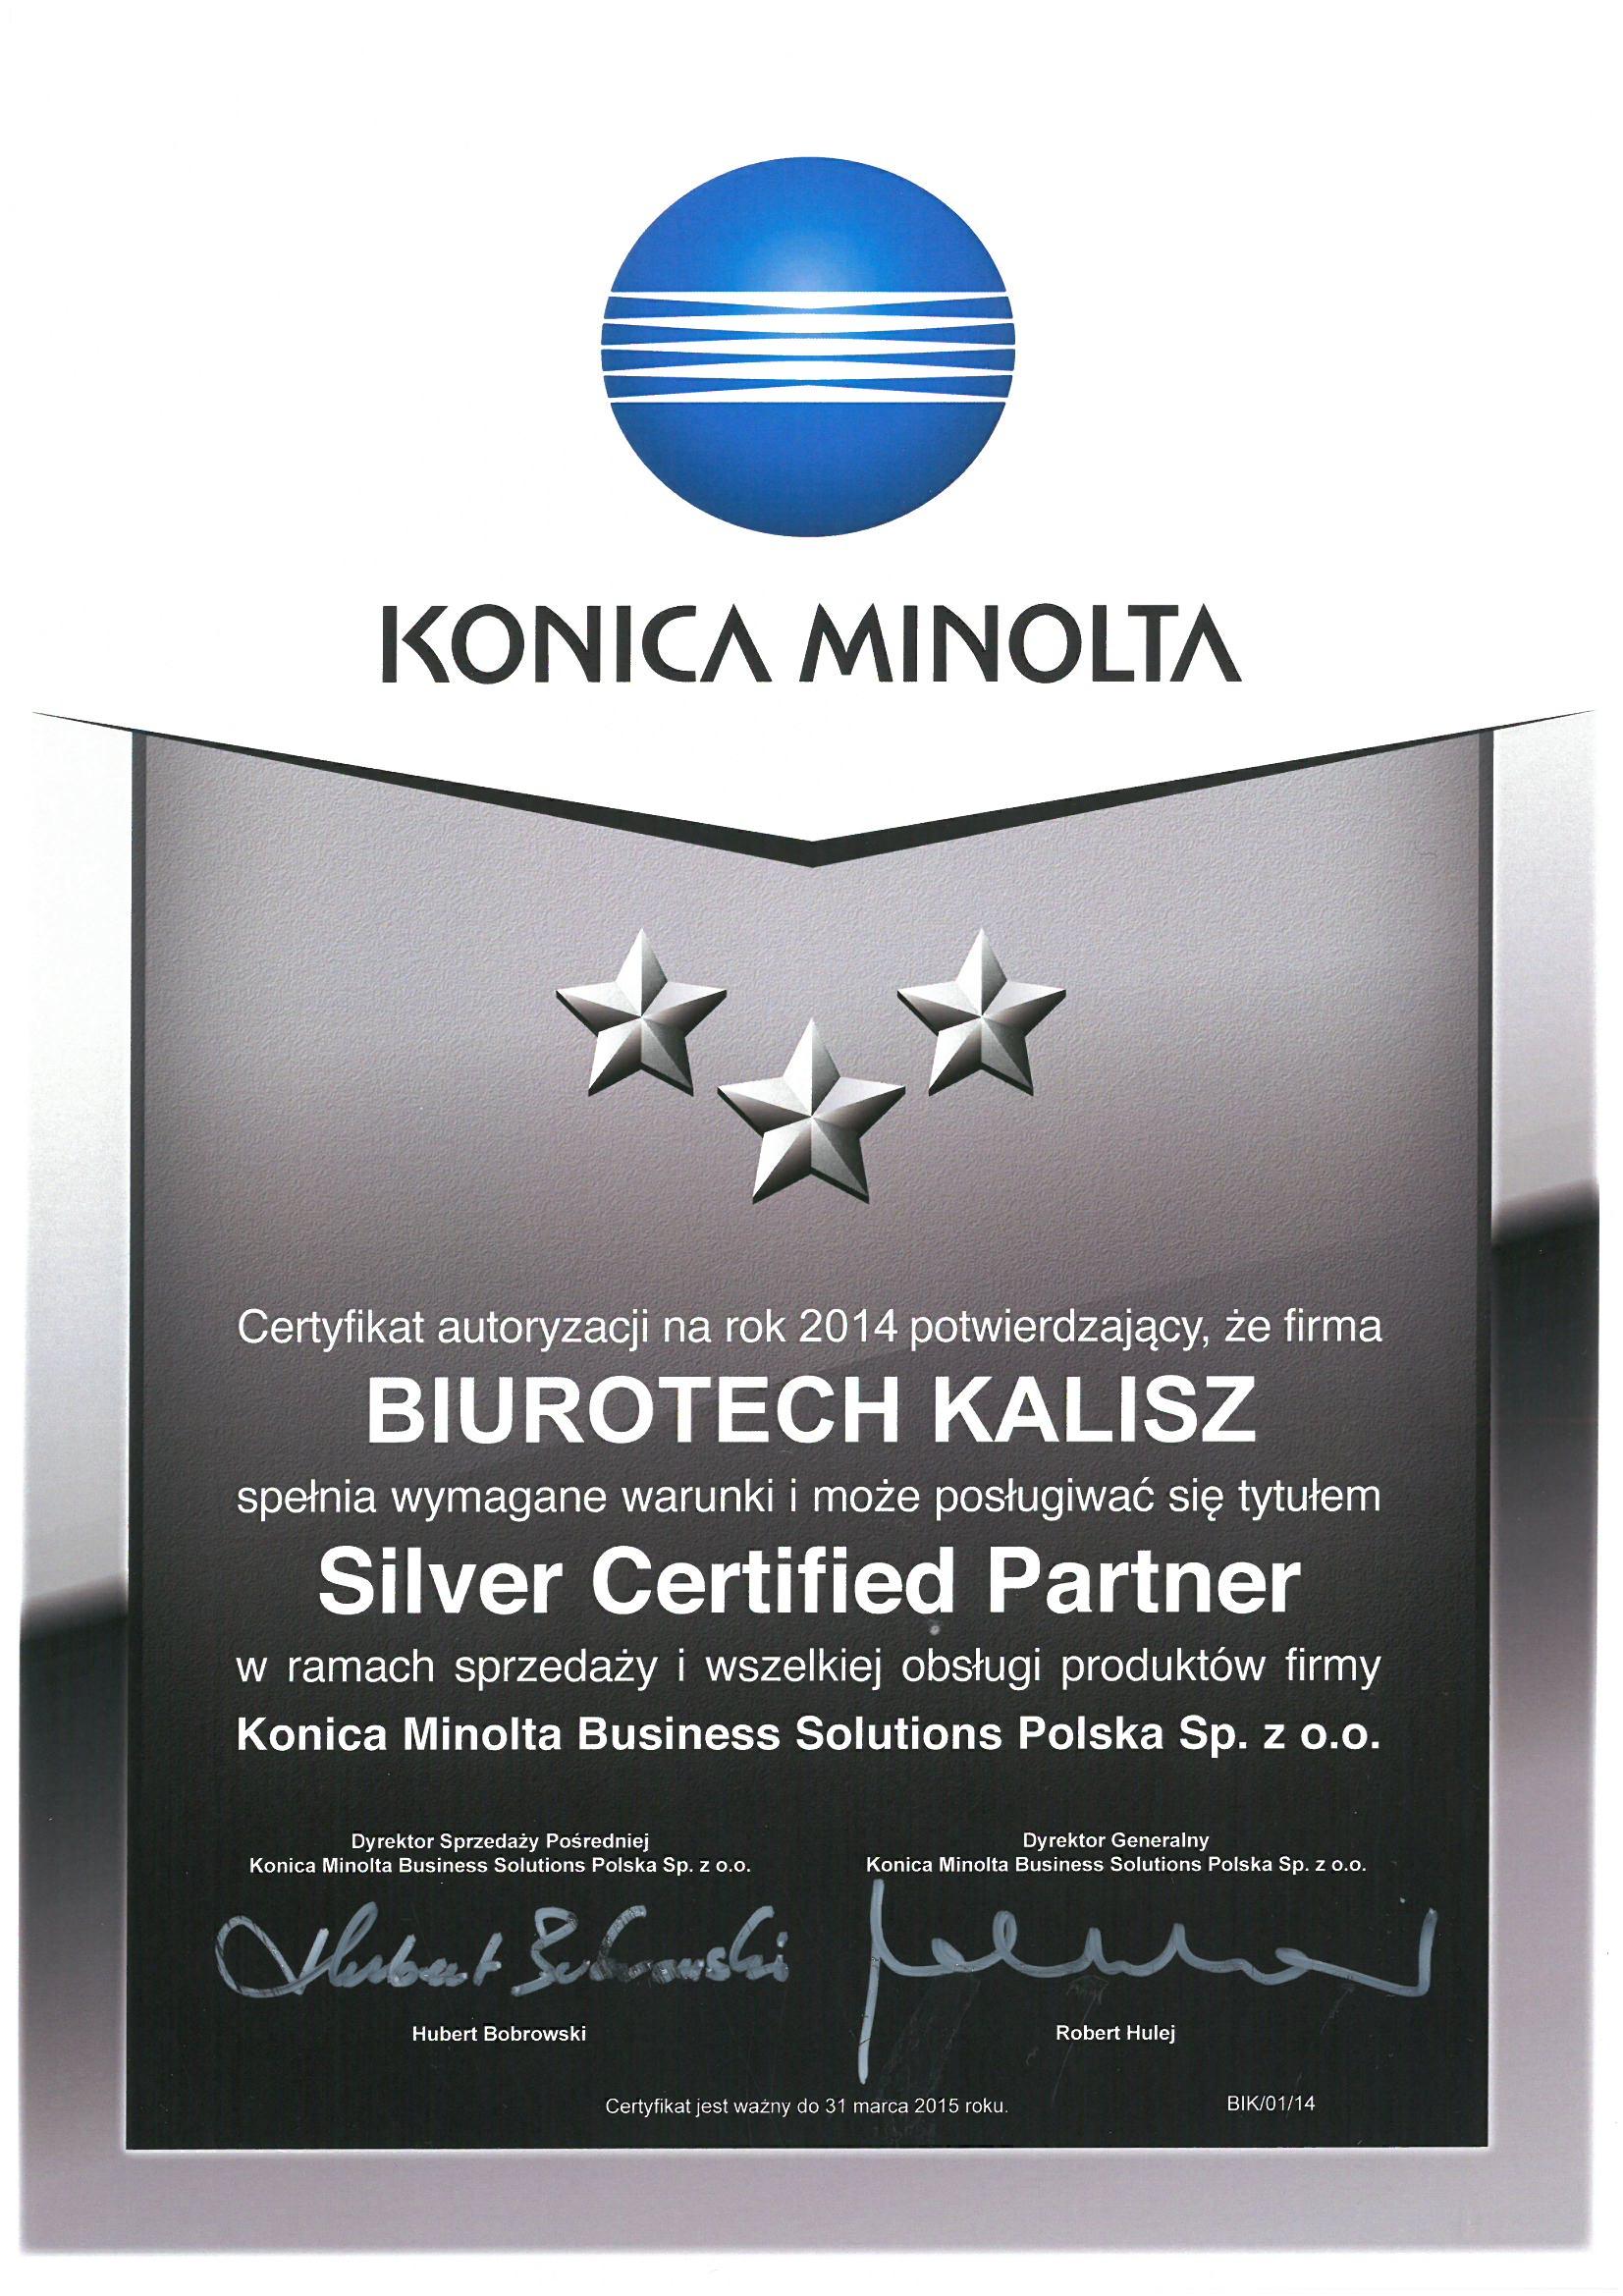 Biurotech - autoryzowany partner Konica Minolta 2014